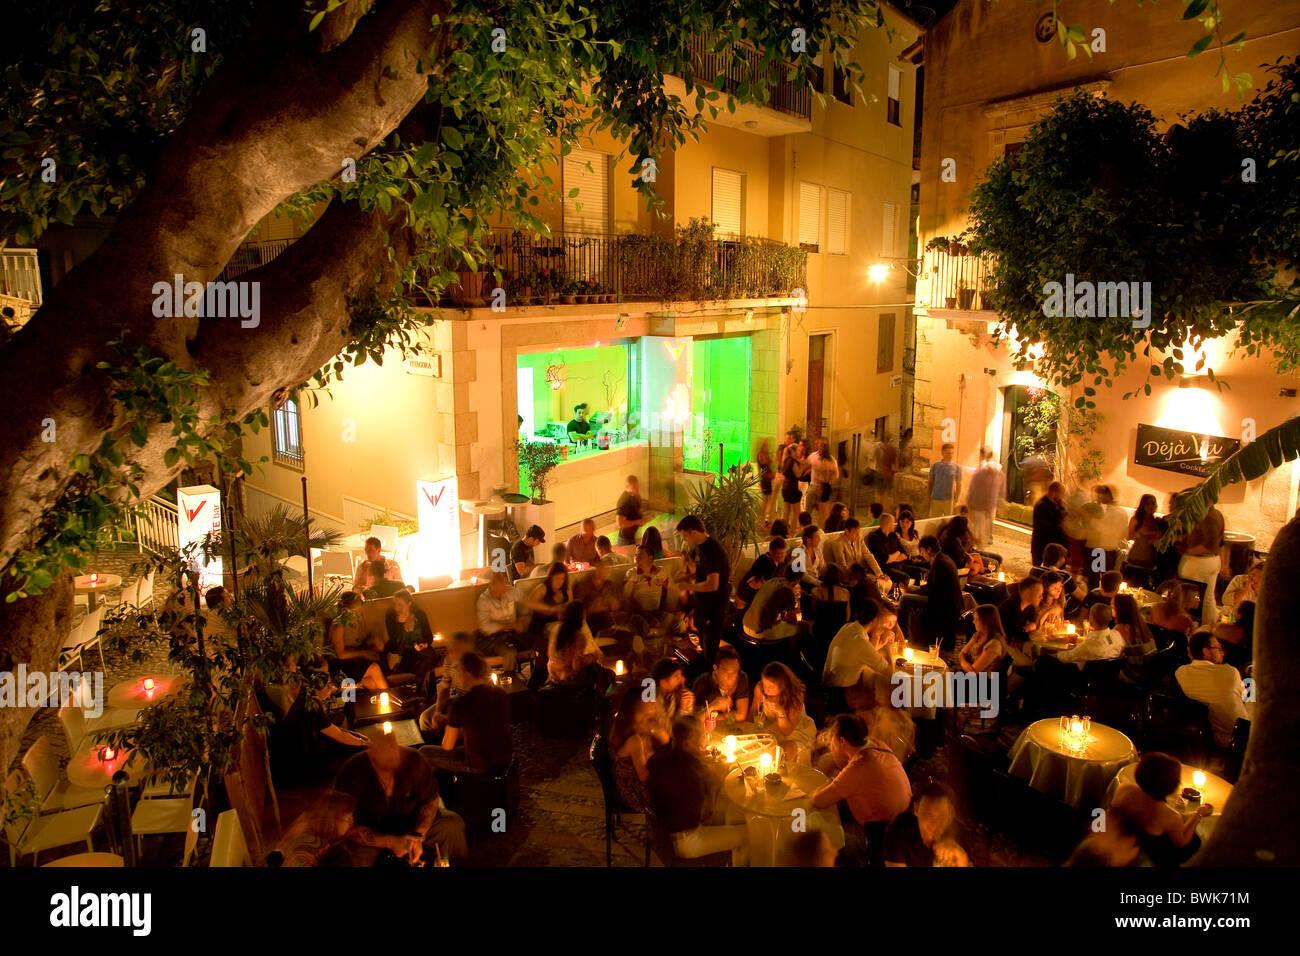 Deja Vu, eine cocktail-Bar am Piazza Garibaldi Platz, Nachtleben in Taormina, Provinz Messina, Sizilien, Italien, Stockbild